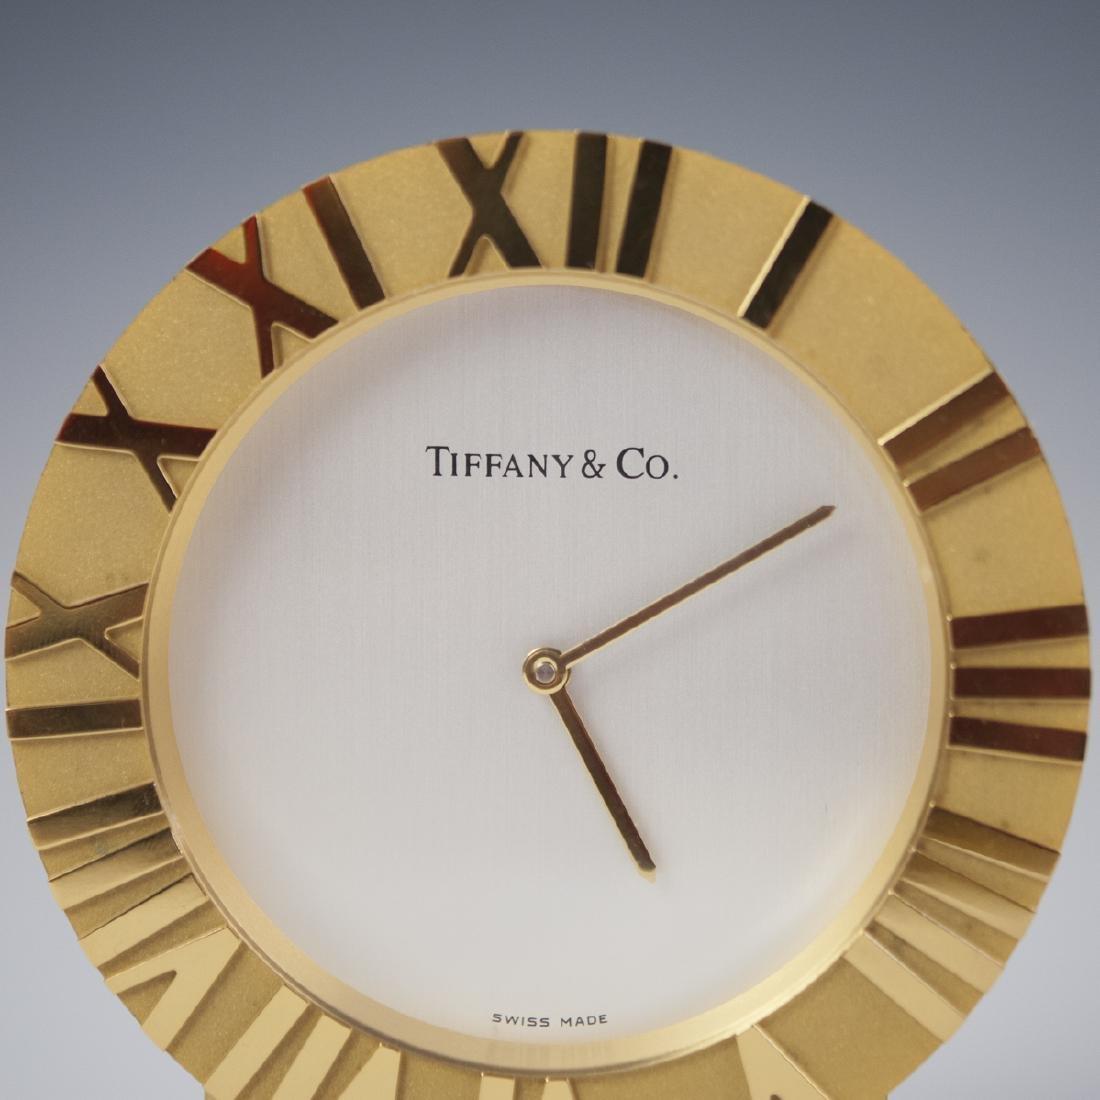 Tiffany & Co. Gilt Brass Desk Clock - 2